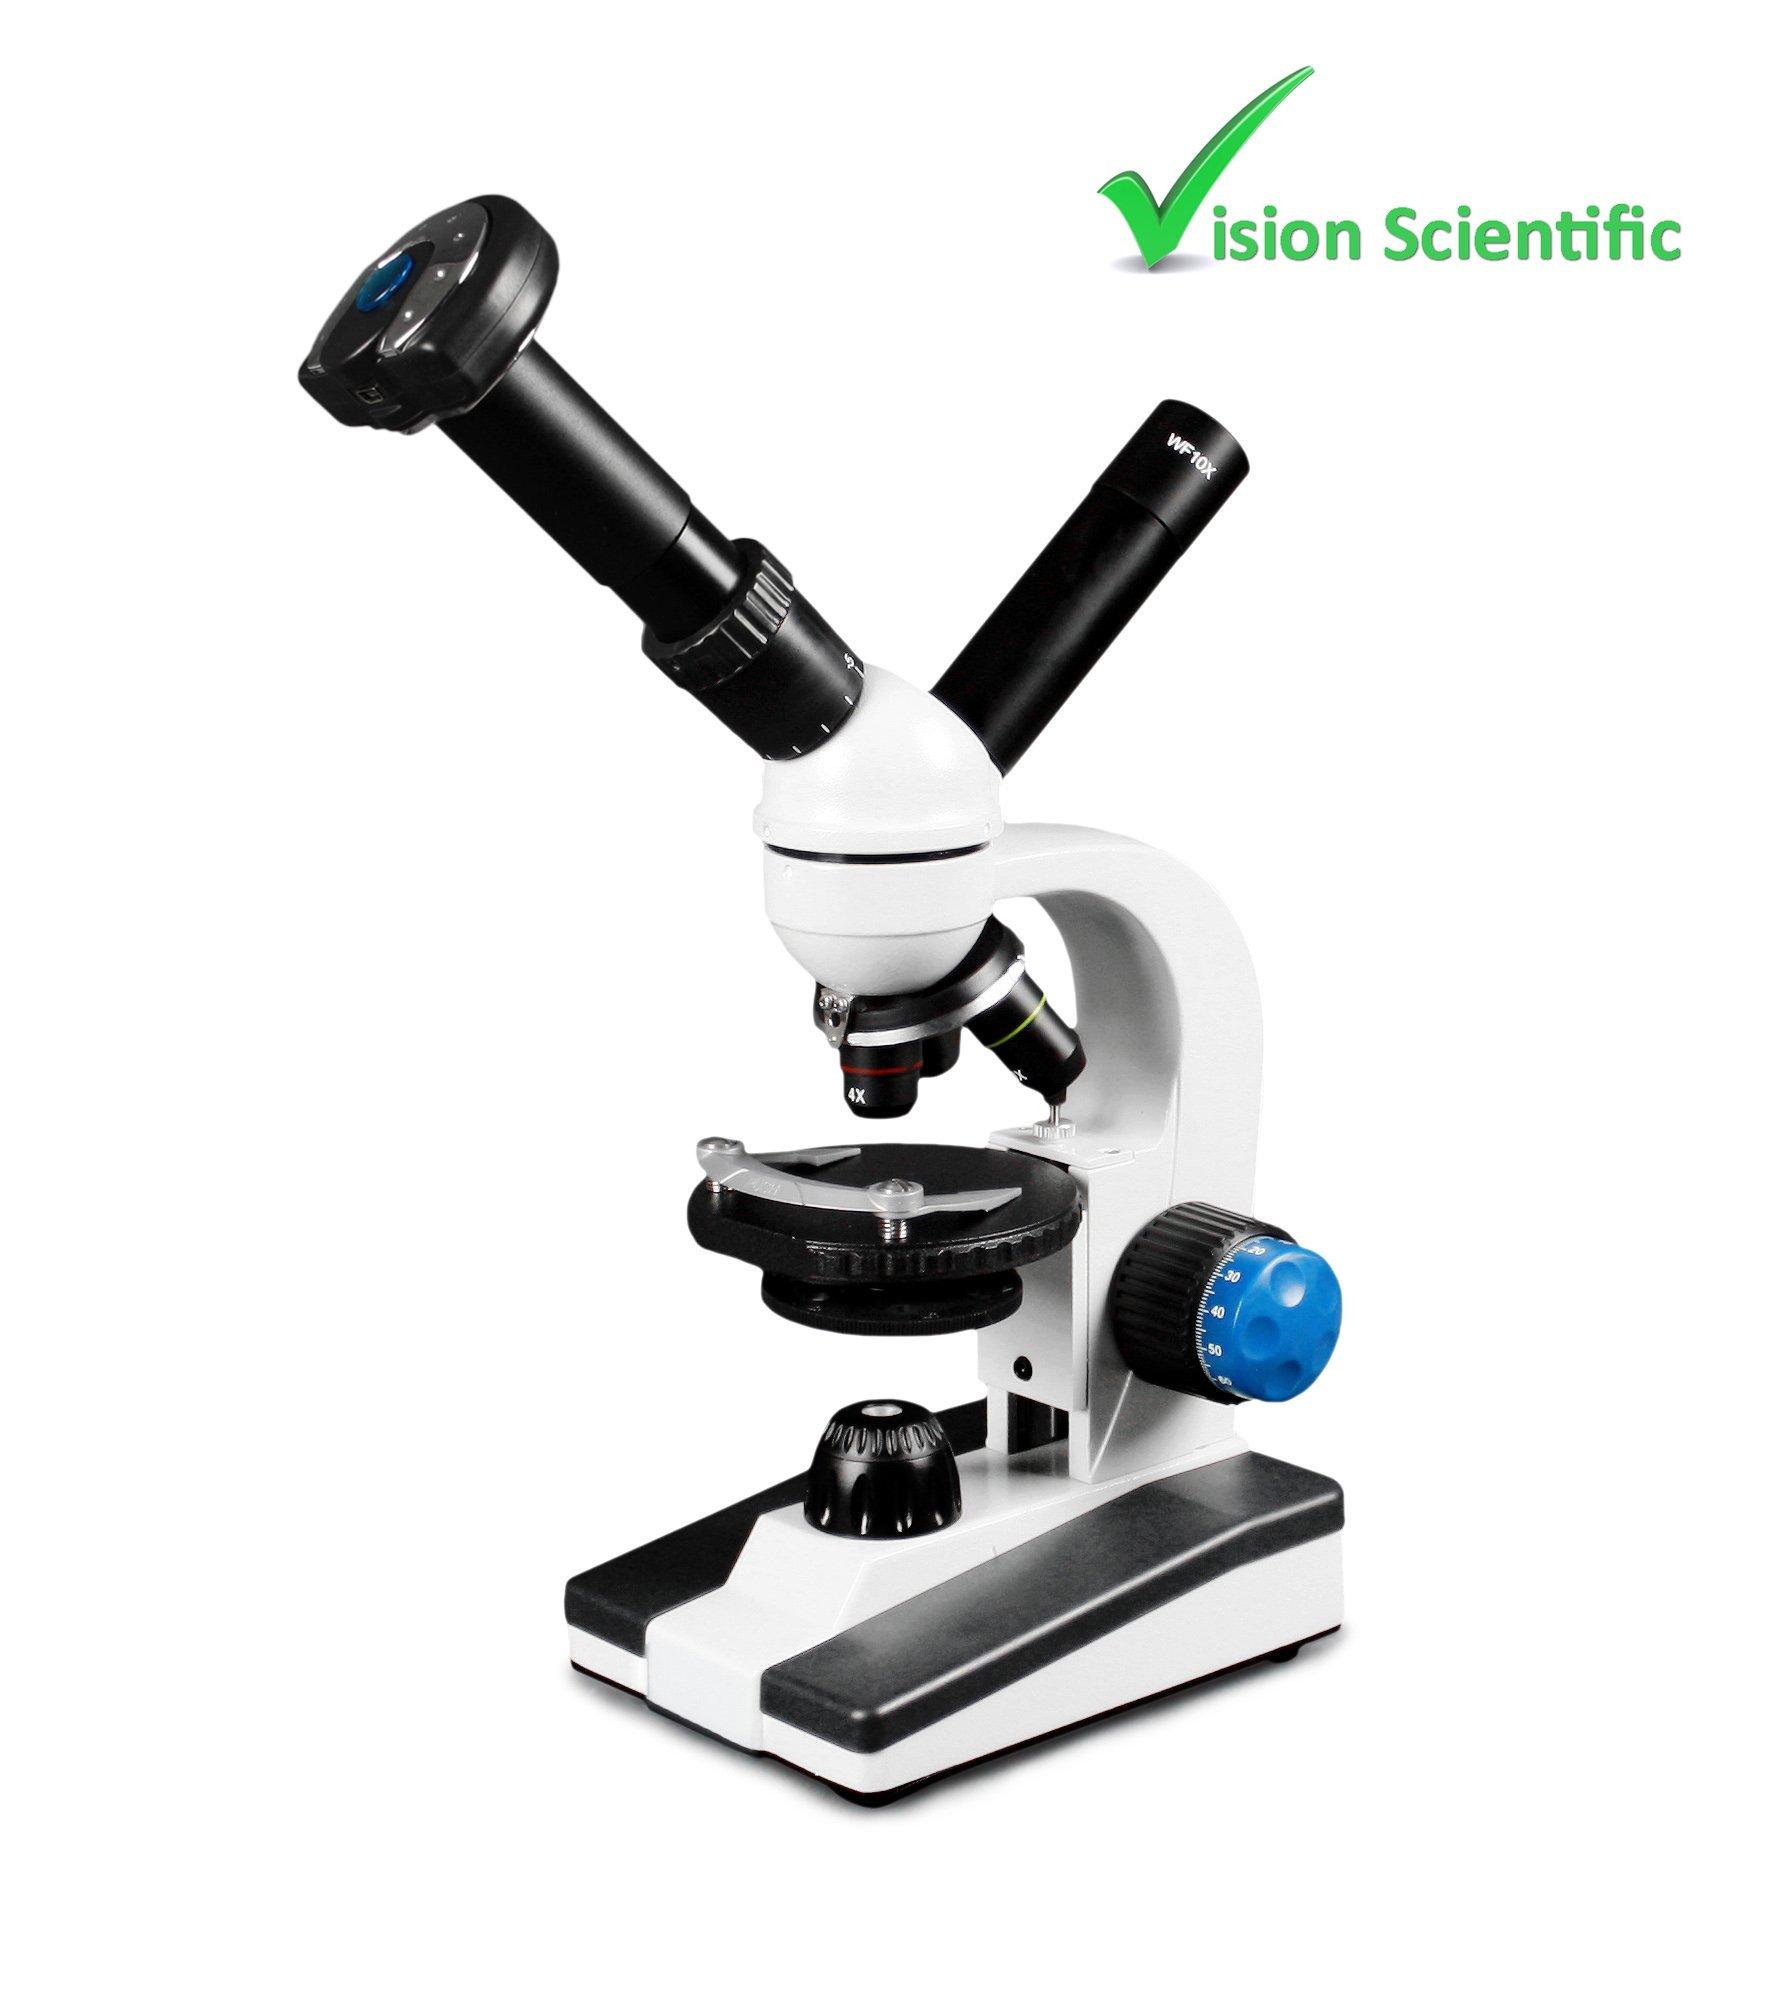 Vision Scientific VME0018-T-LD-DG1.3 Dual View Compound Microscope, 10x WF & 25x WF Eyepiece, 40x—1000x Magnification, LED Illumination, Round Stage, 1.3MP Digital Eyepiece Camera